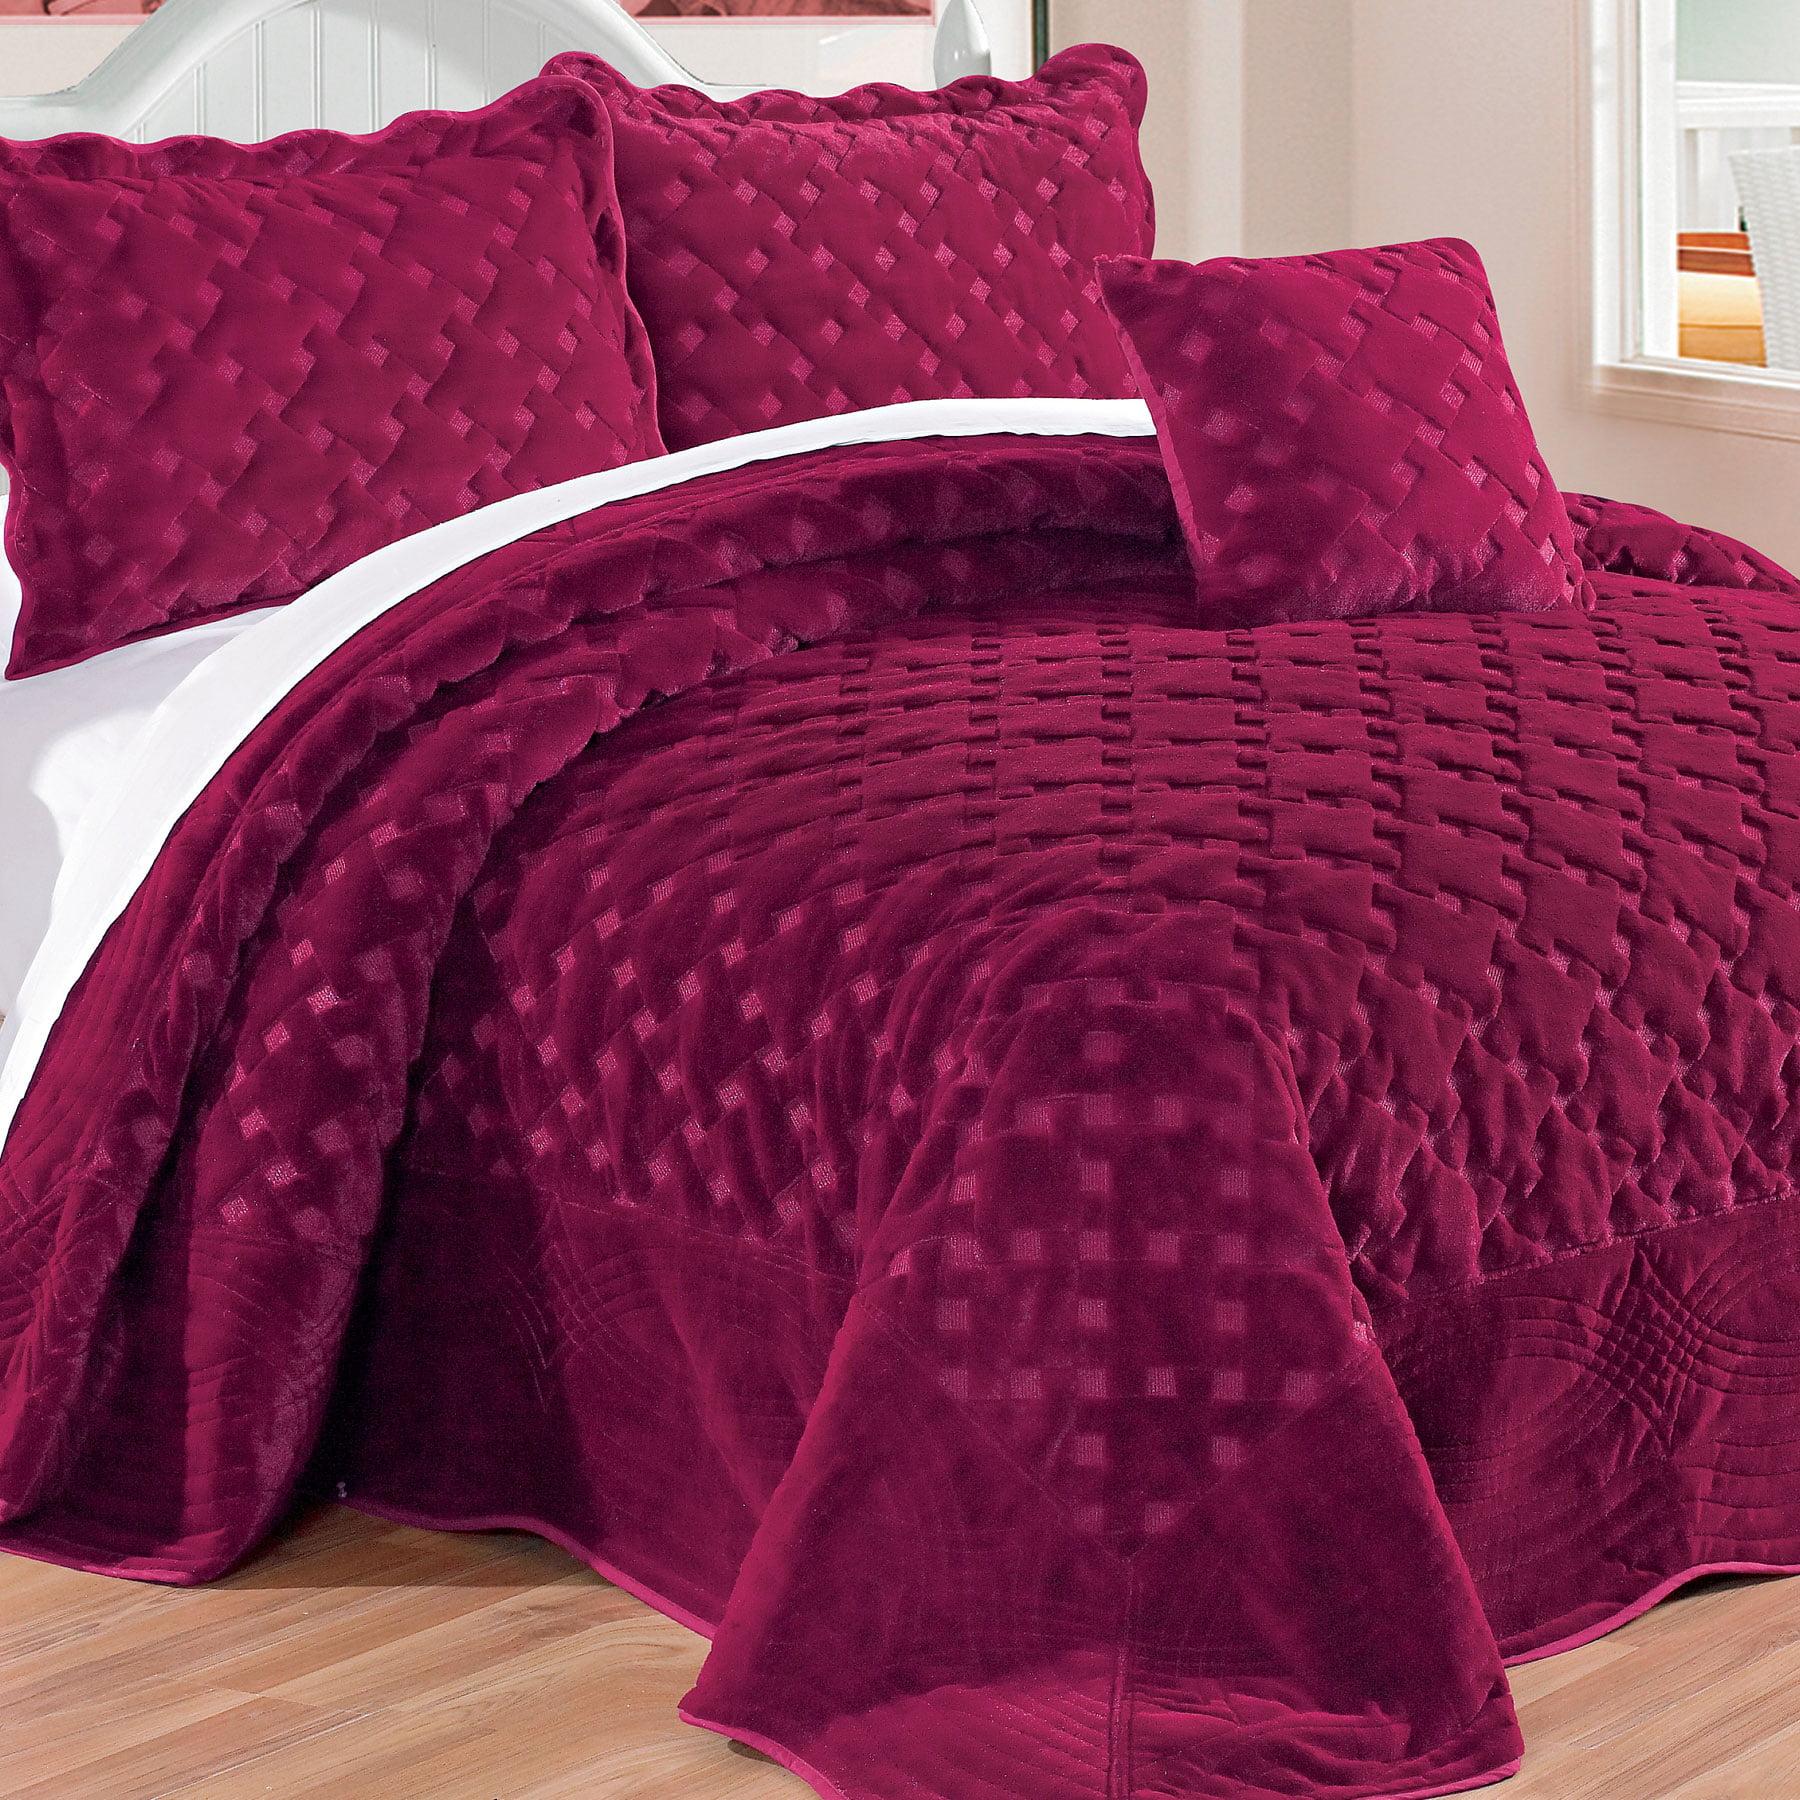 Serenta Tatami Quilted Faux Fur 4 Piece Bedspread Set